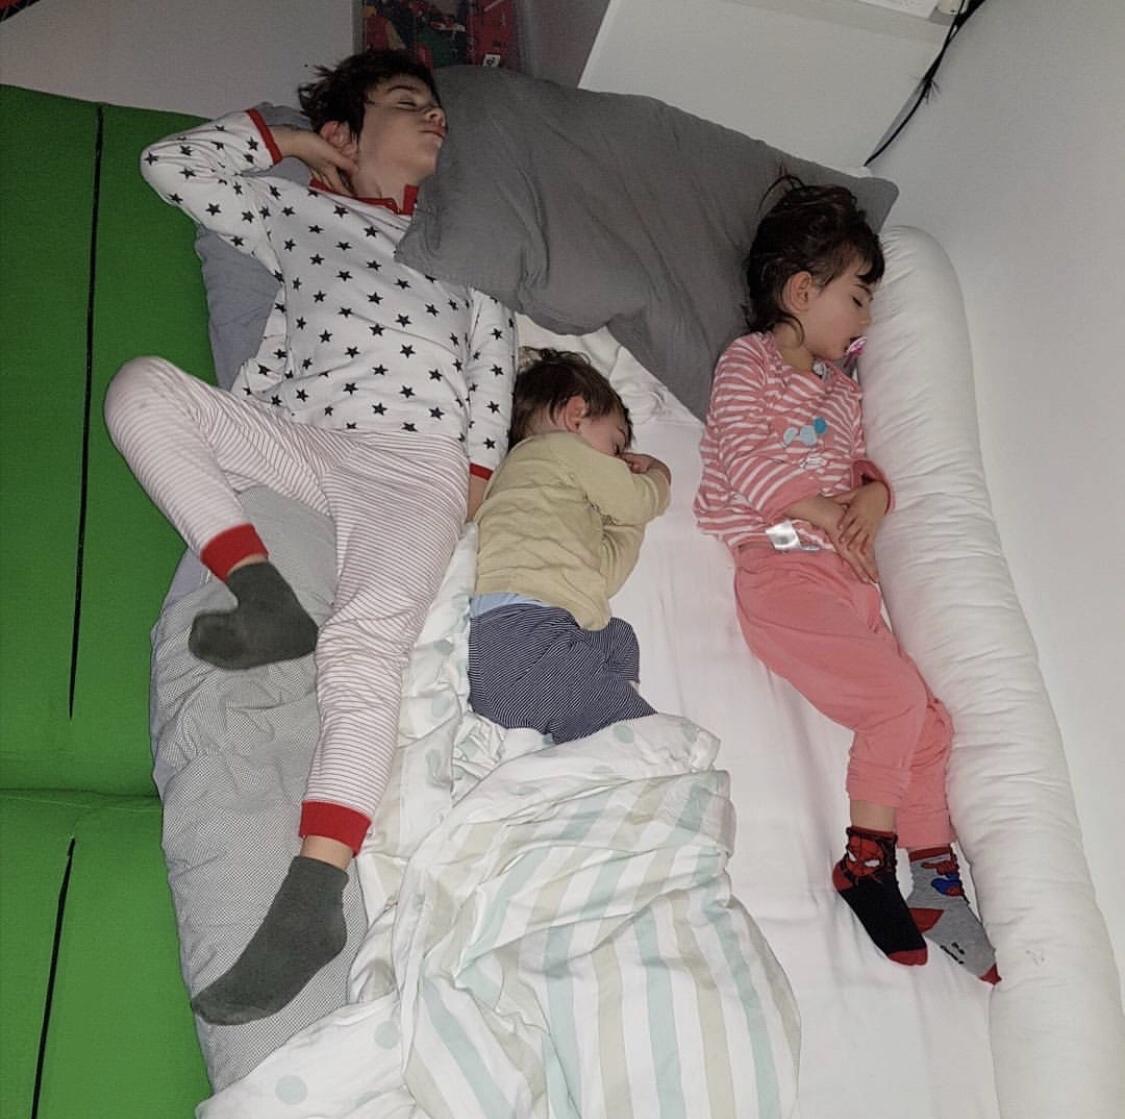 Co-sleeping-fratelli